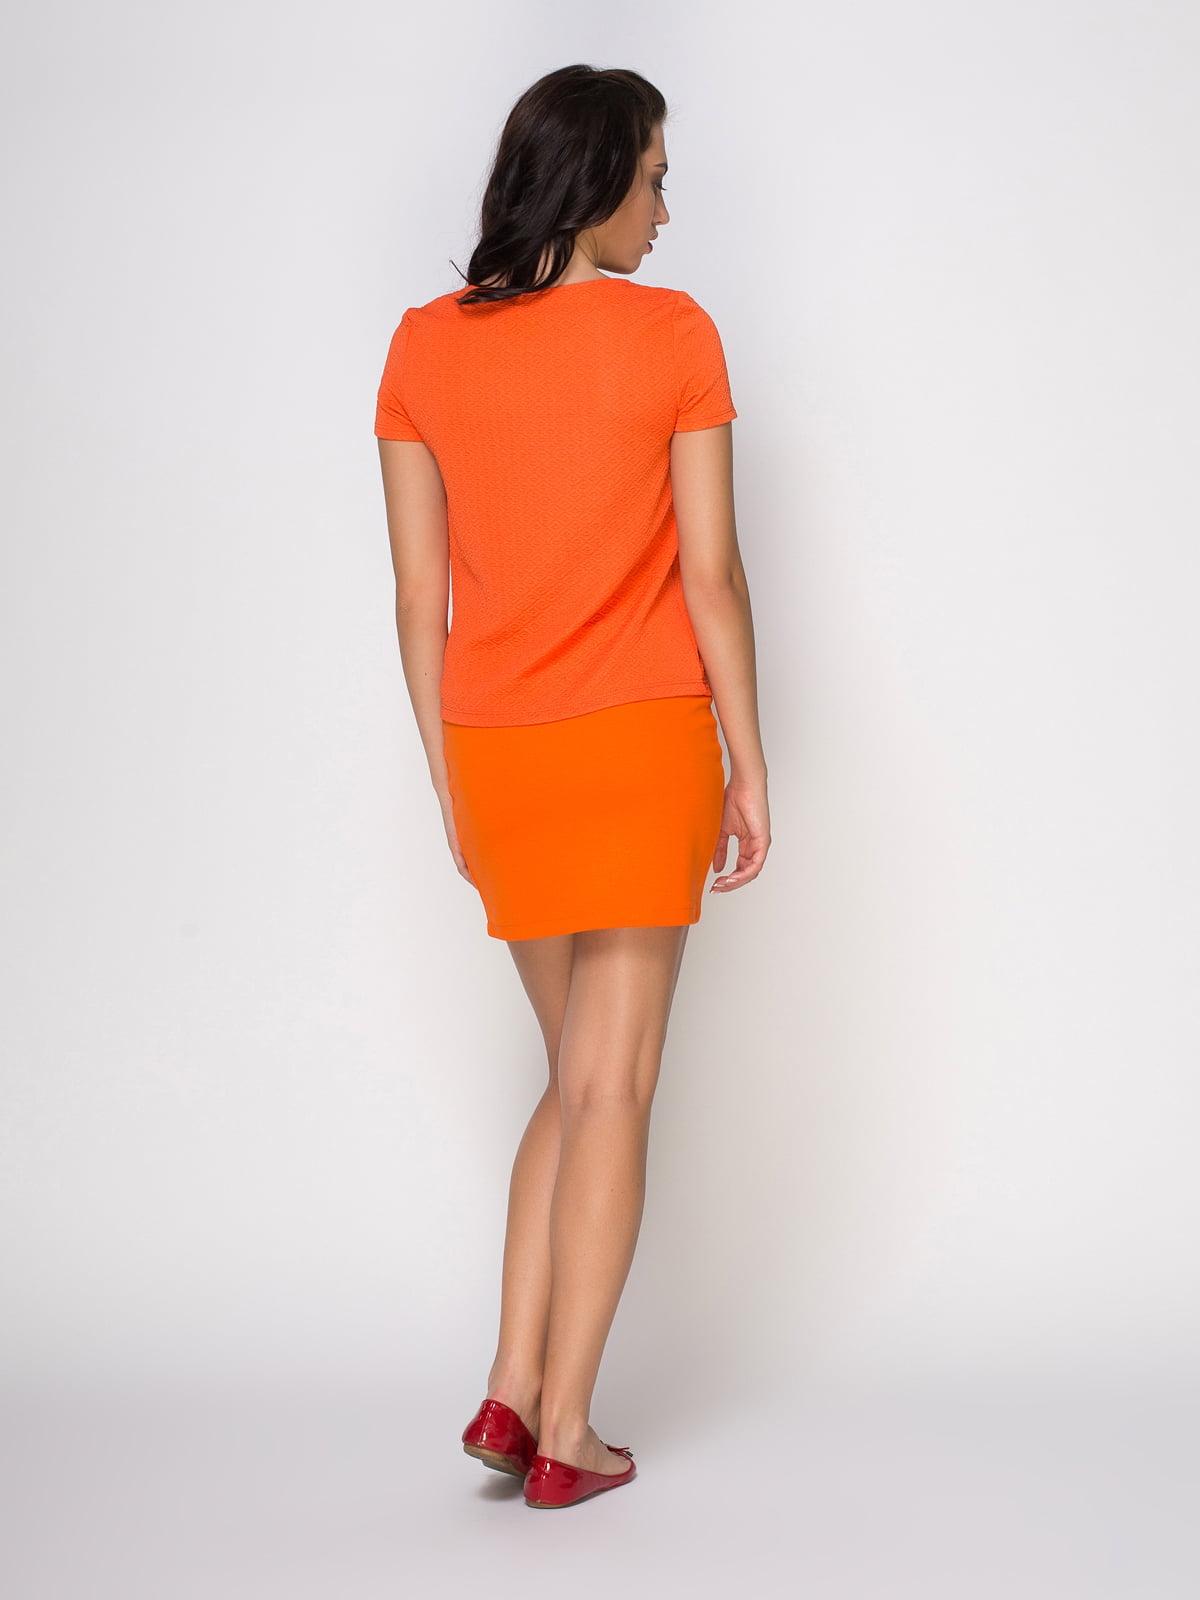 Юбка оранжевая | 3780304 | фото 3